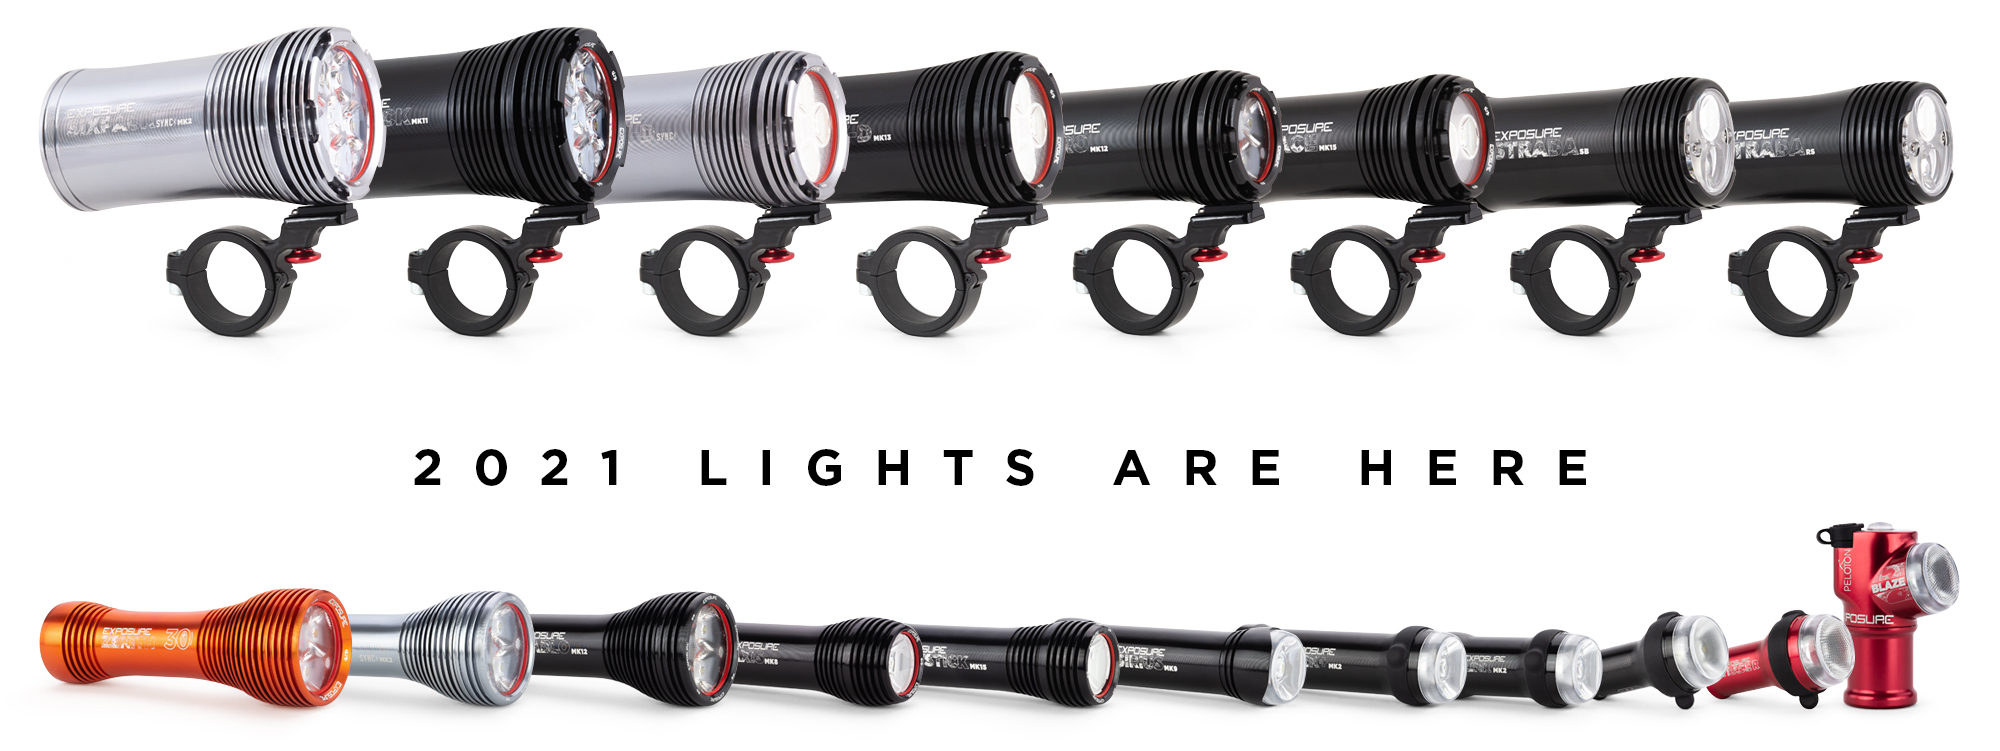 Exposure Lights 2021